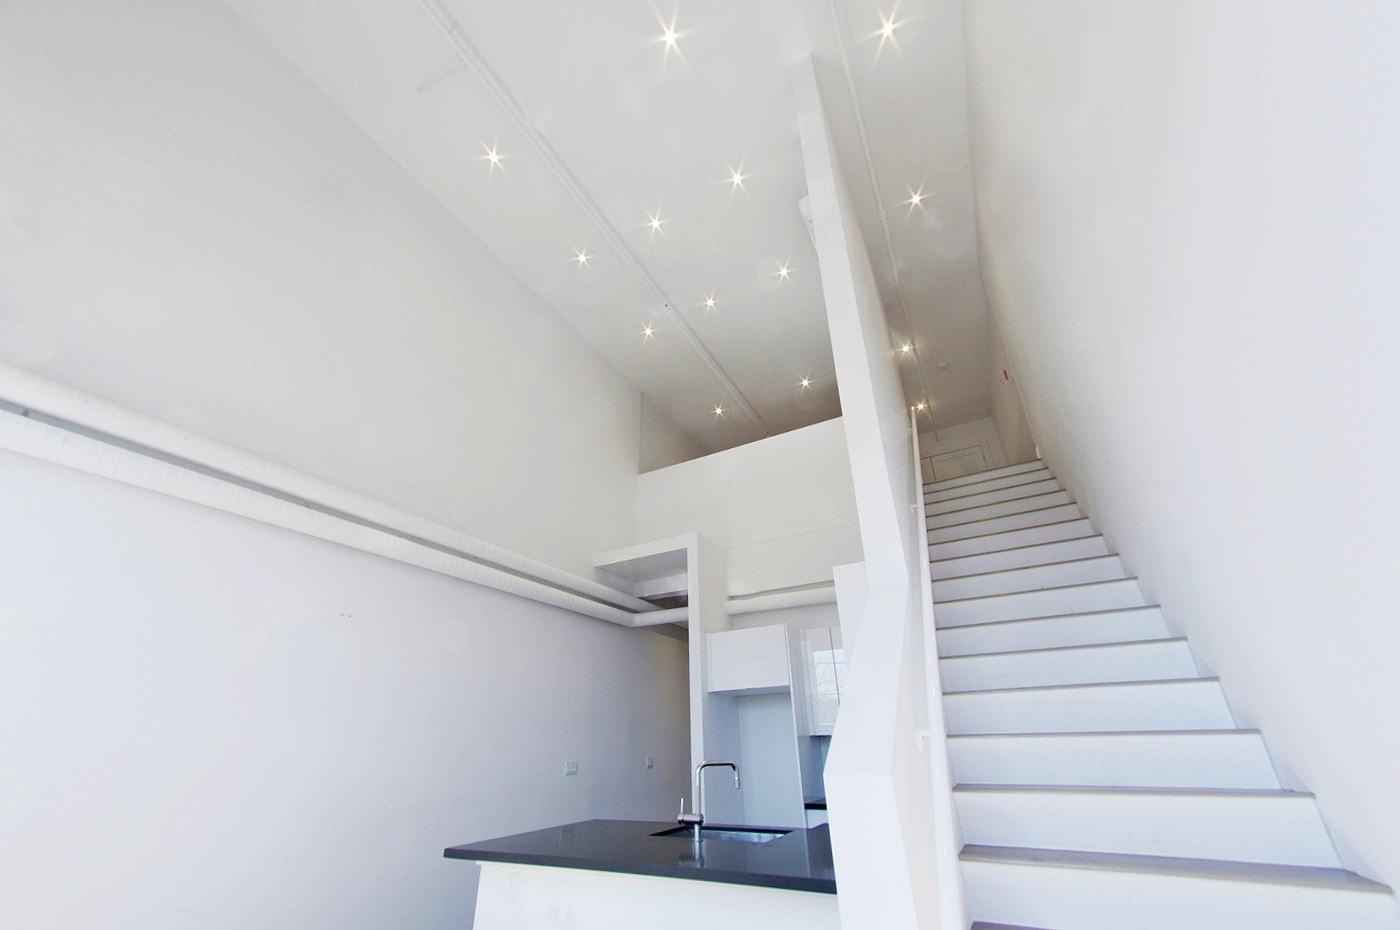 Dundurn Lofts Unit Staircase